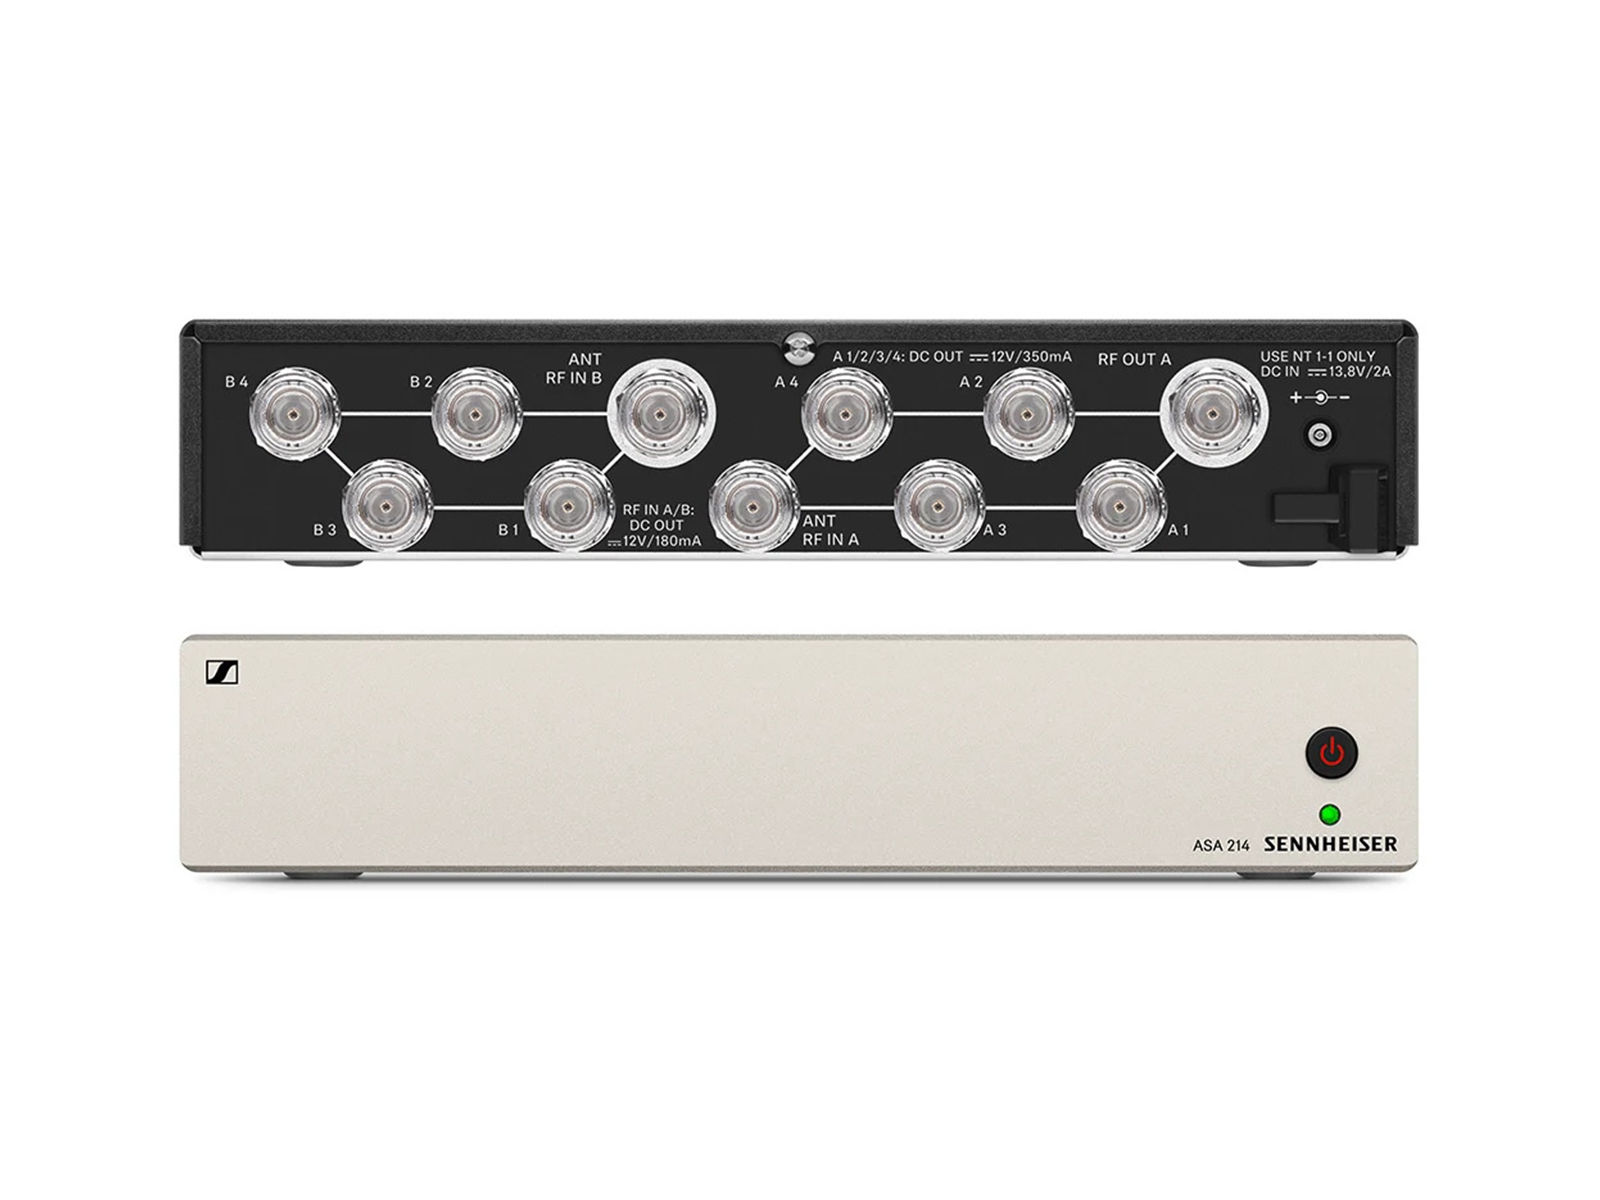 Sennheiser ASA 214-1G8 | Aktiver Antennen-Splitter ew G3 / ew G4,